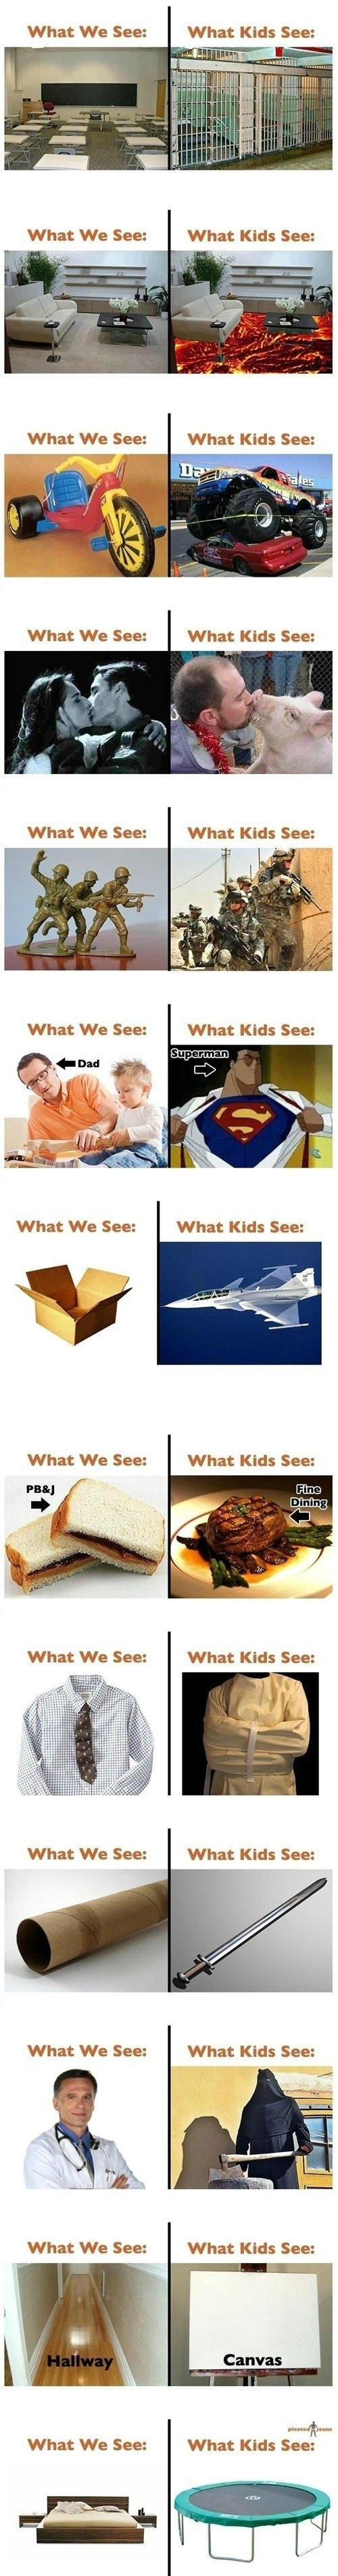 what kids see. . What We See: What Kids See: What We See: What Kids See: What We See: What Kids See: What: We See: What Kids See: What We See: What Kids See: Wh